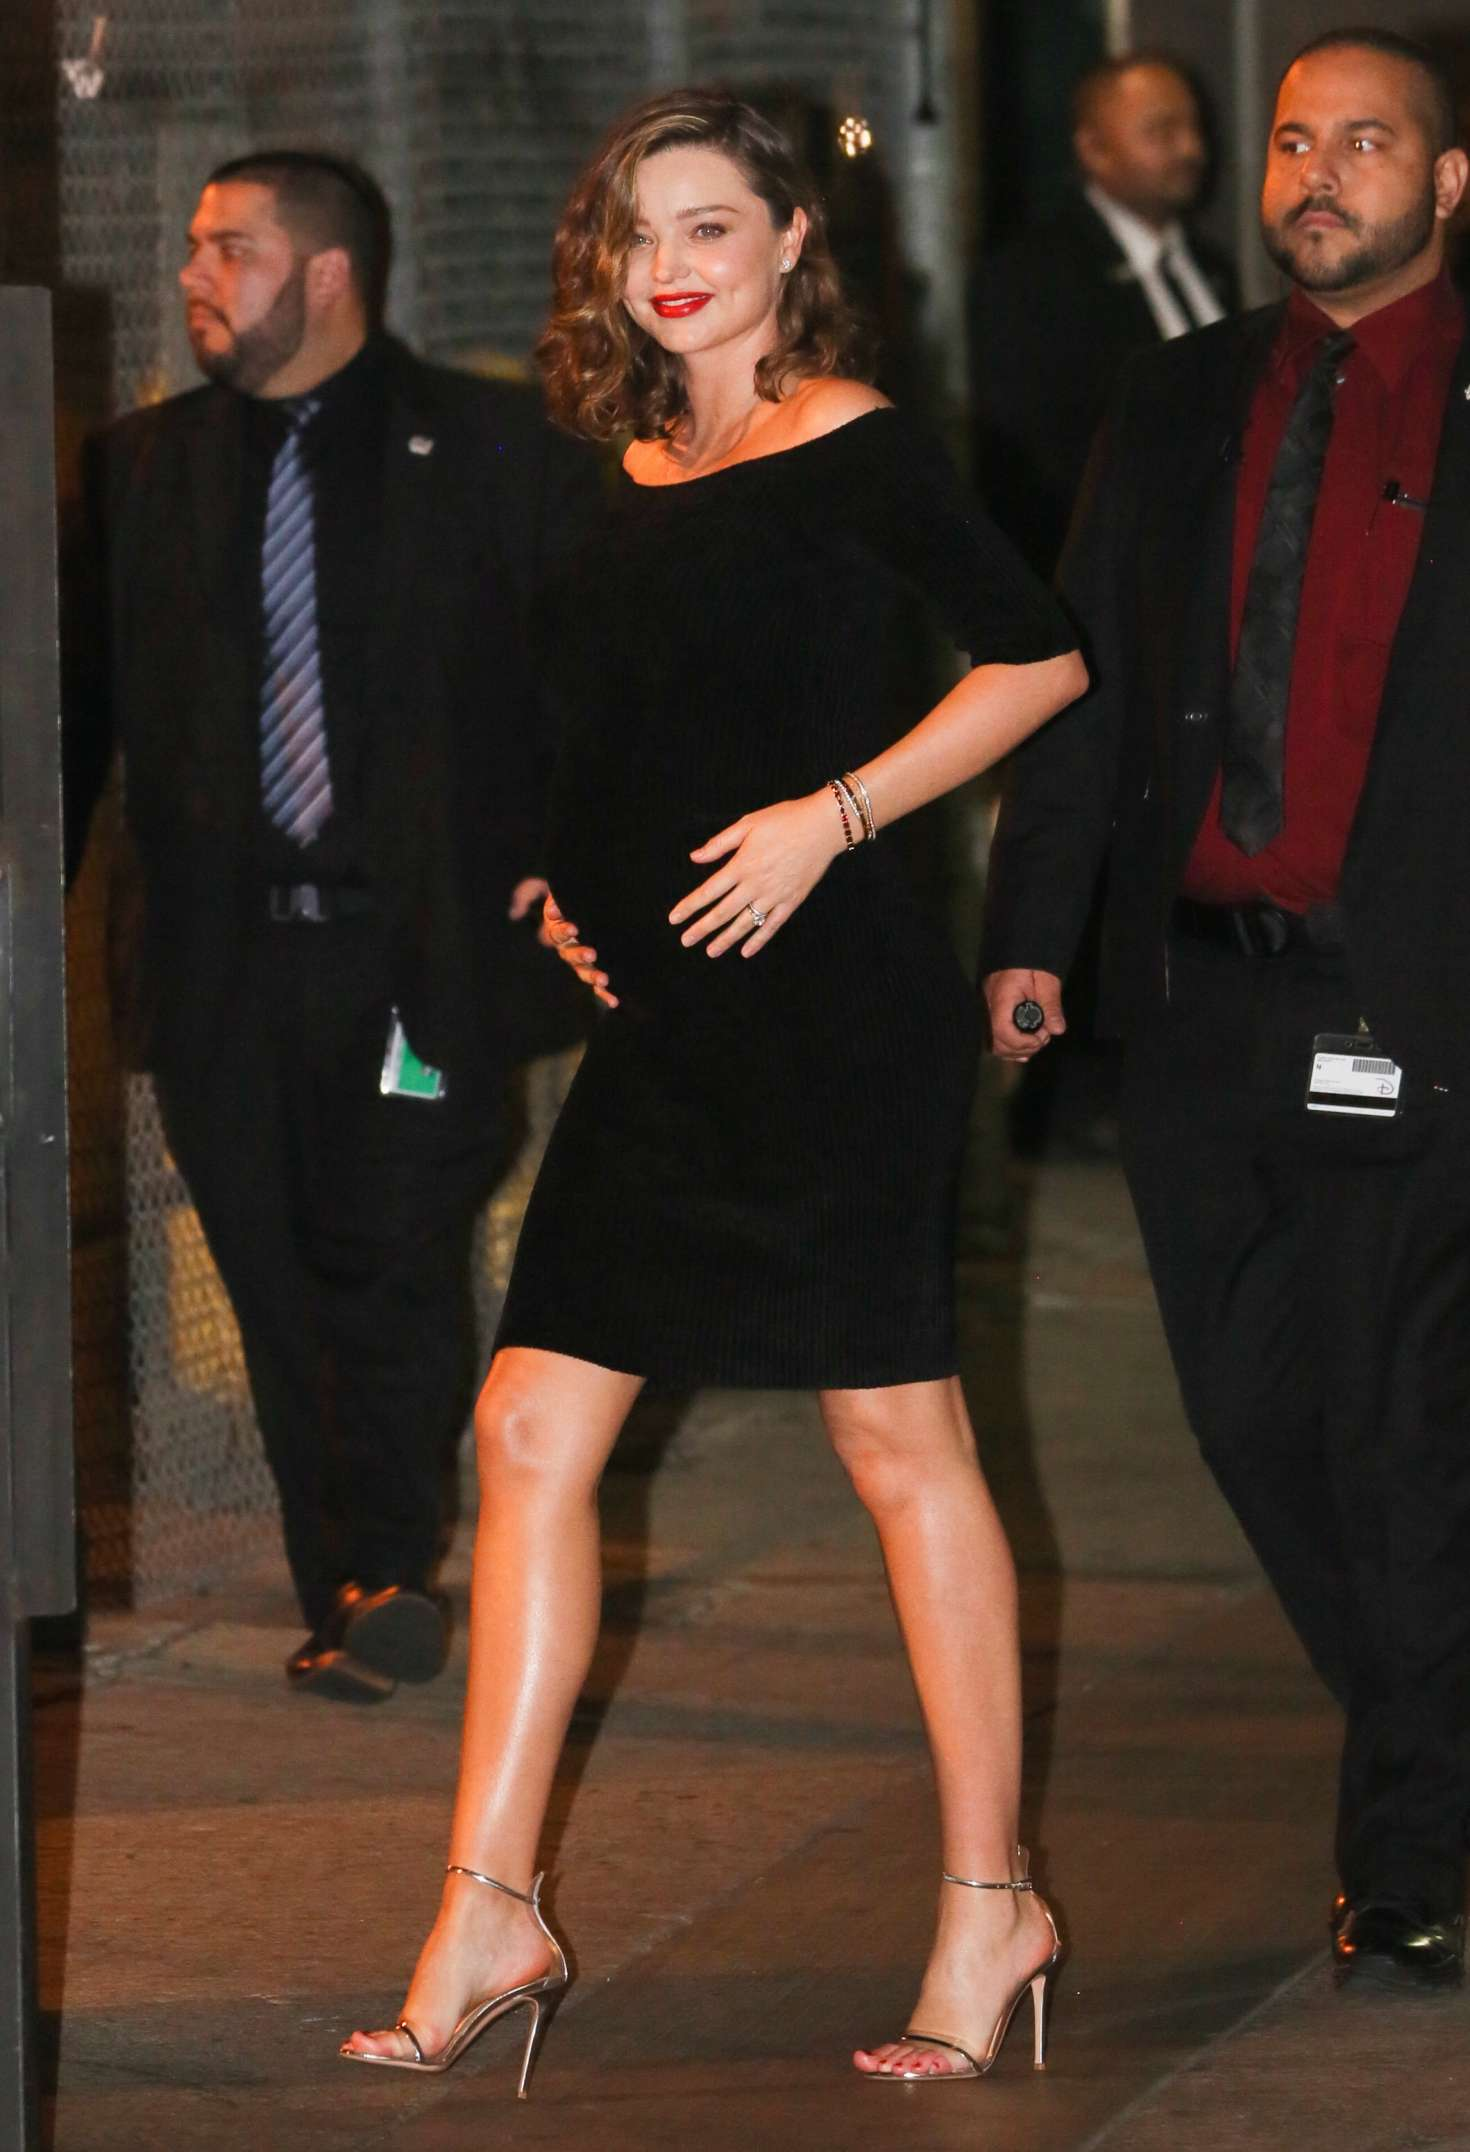 Miranda Kerr 2018 : Miranda Kerr: Leaves at Jimmy Kimmel Live -02